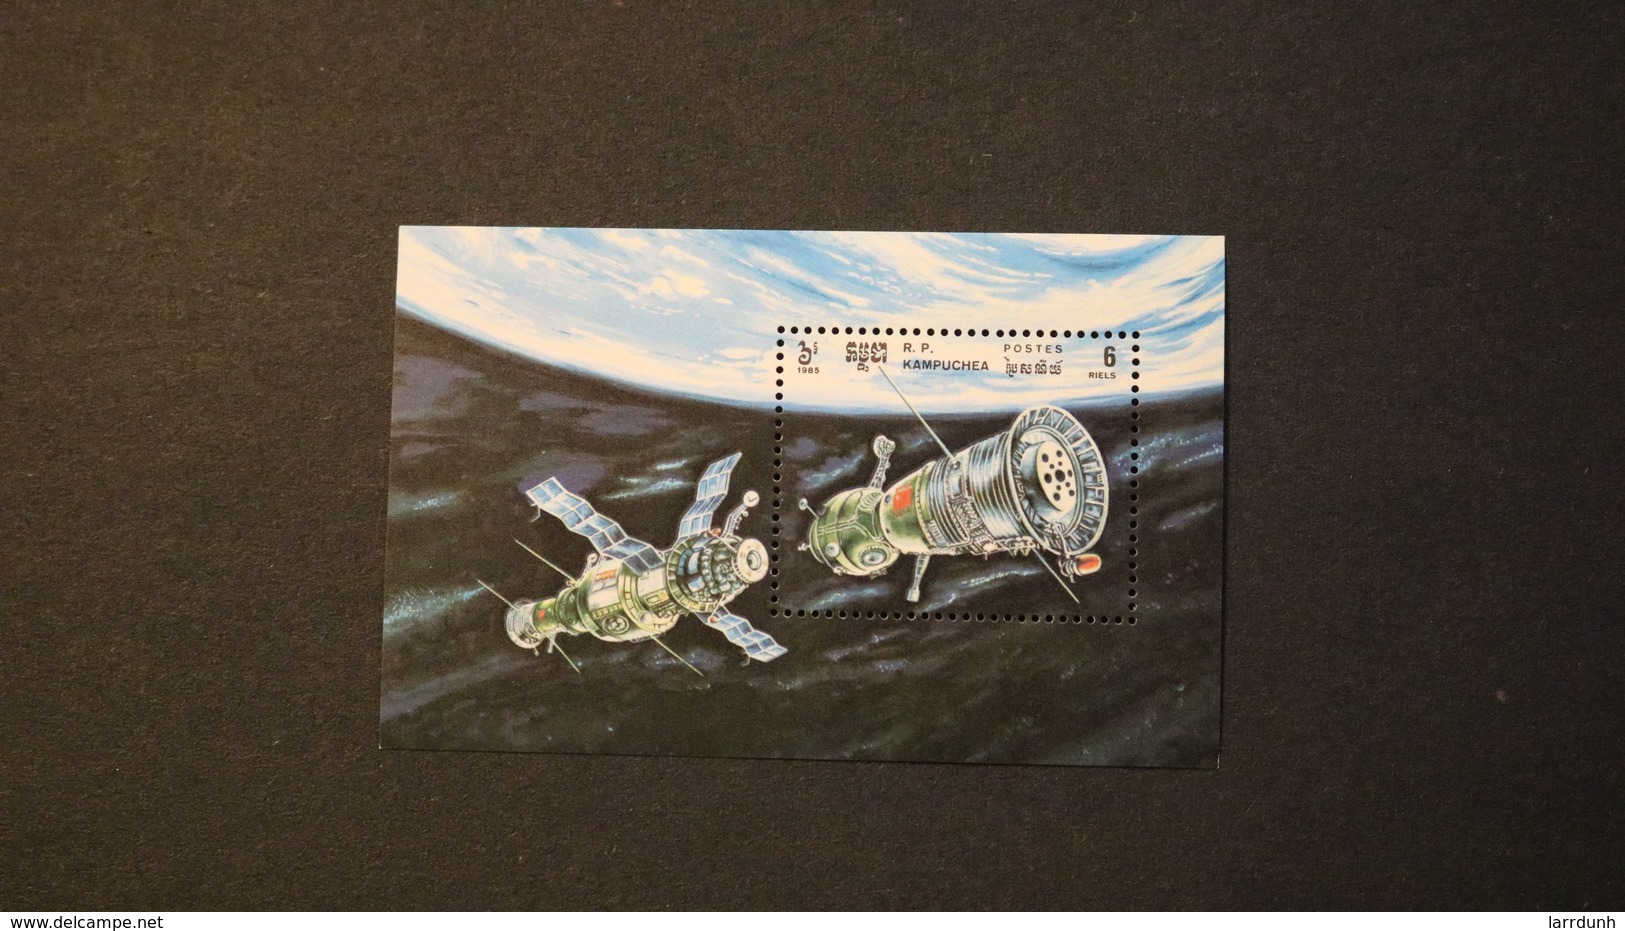 Kampuchea Space Station/Exploration/Soyuz/Salyut/Capsules 1985 Souvenir Sheet Block MNH  A04s - Kampuchea